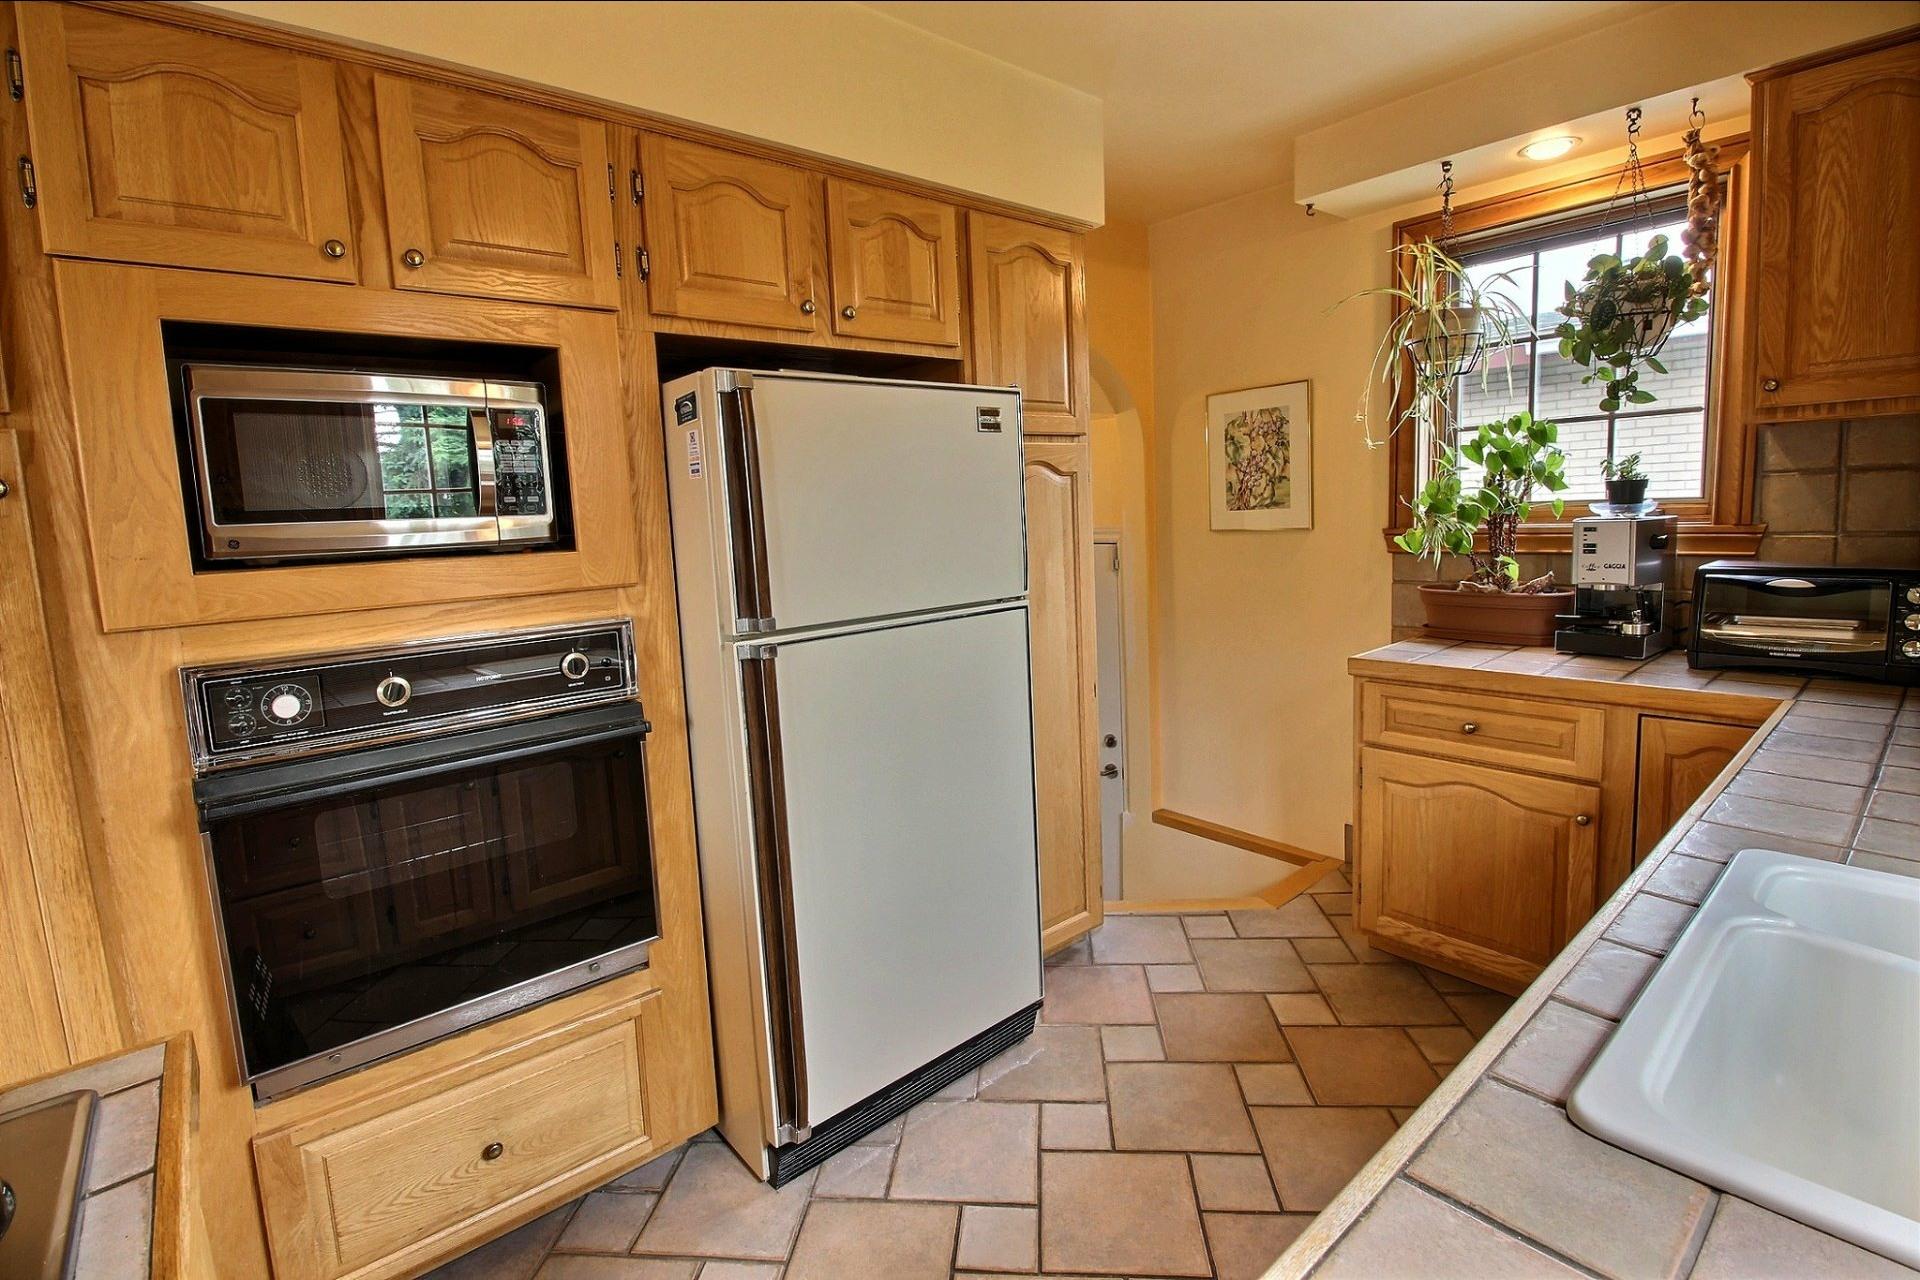 House For Sale Montreal Saint Leonard 11 Rooms